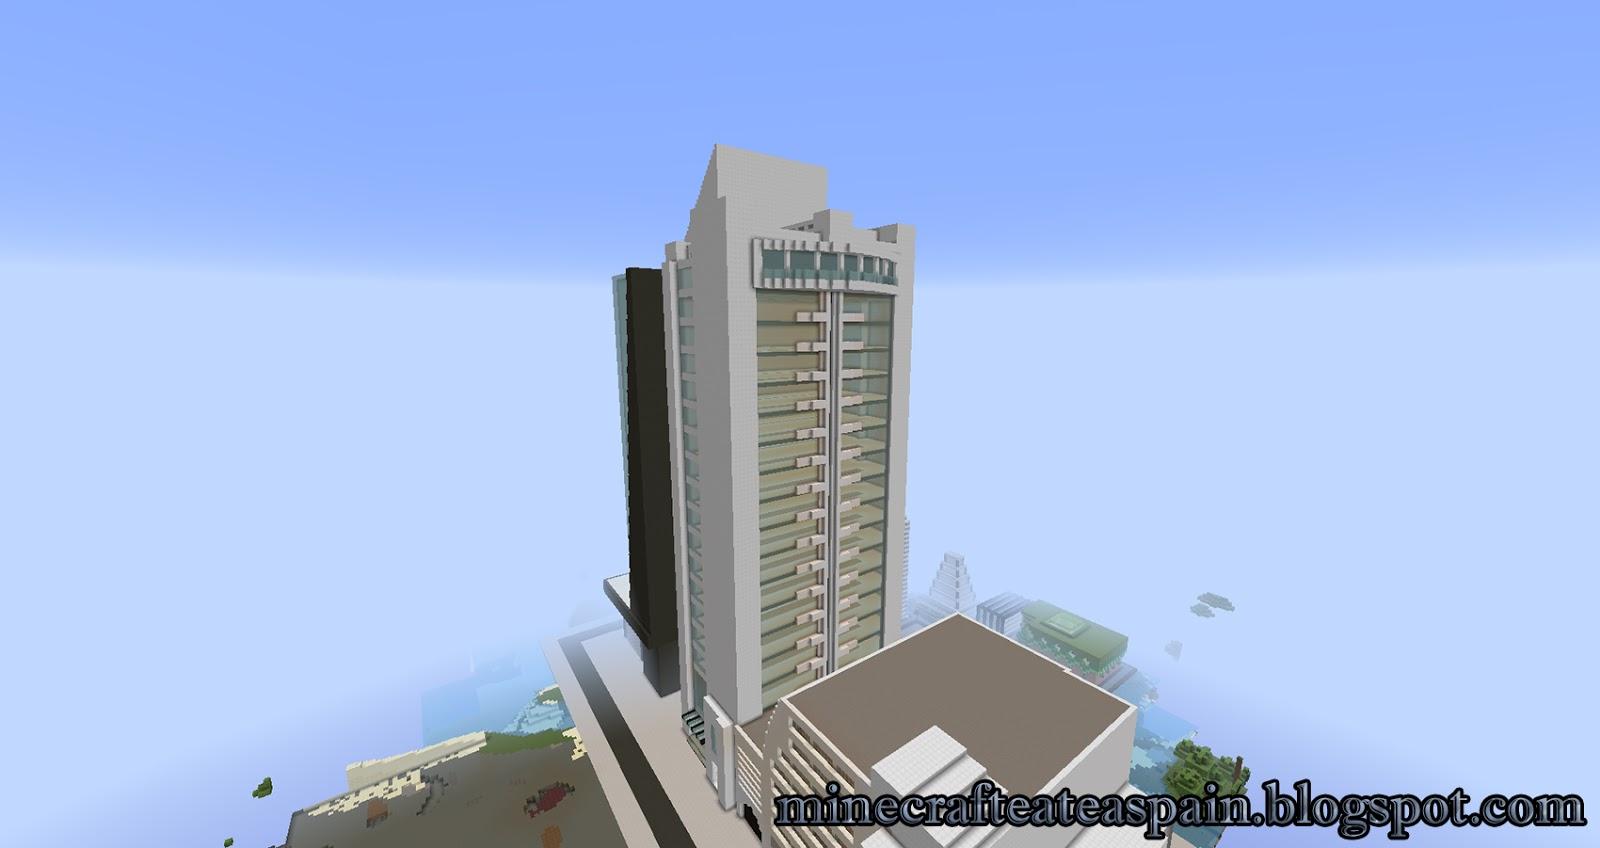 Minecrafteate r plica minecraft de la torre duo de bolivia for Minecraft moderno